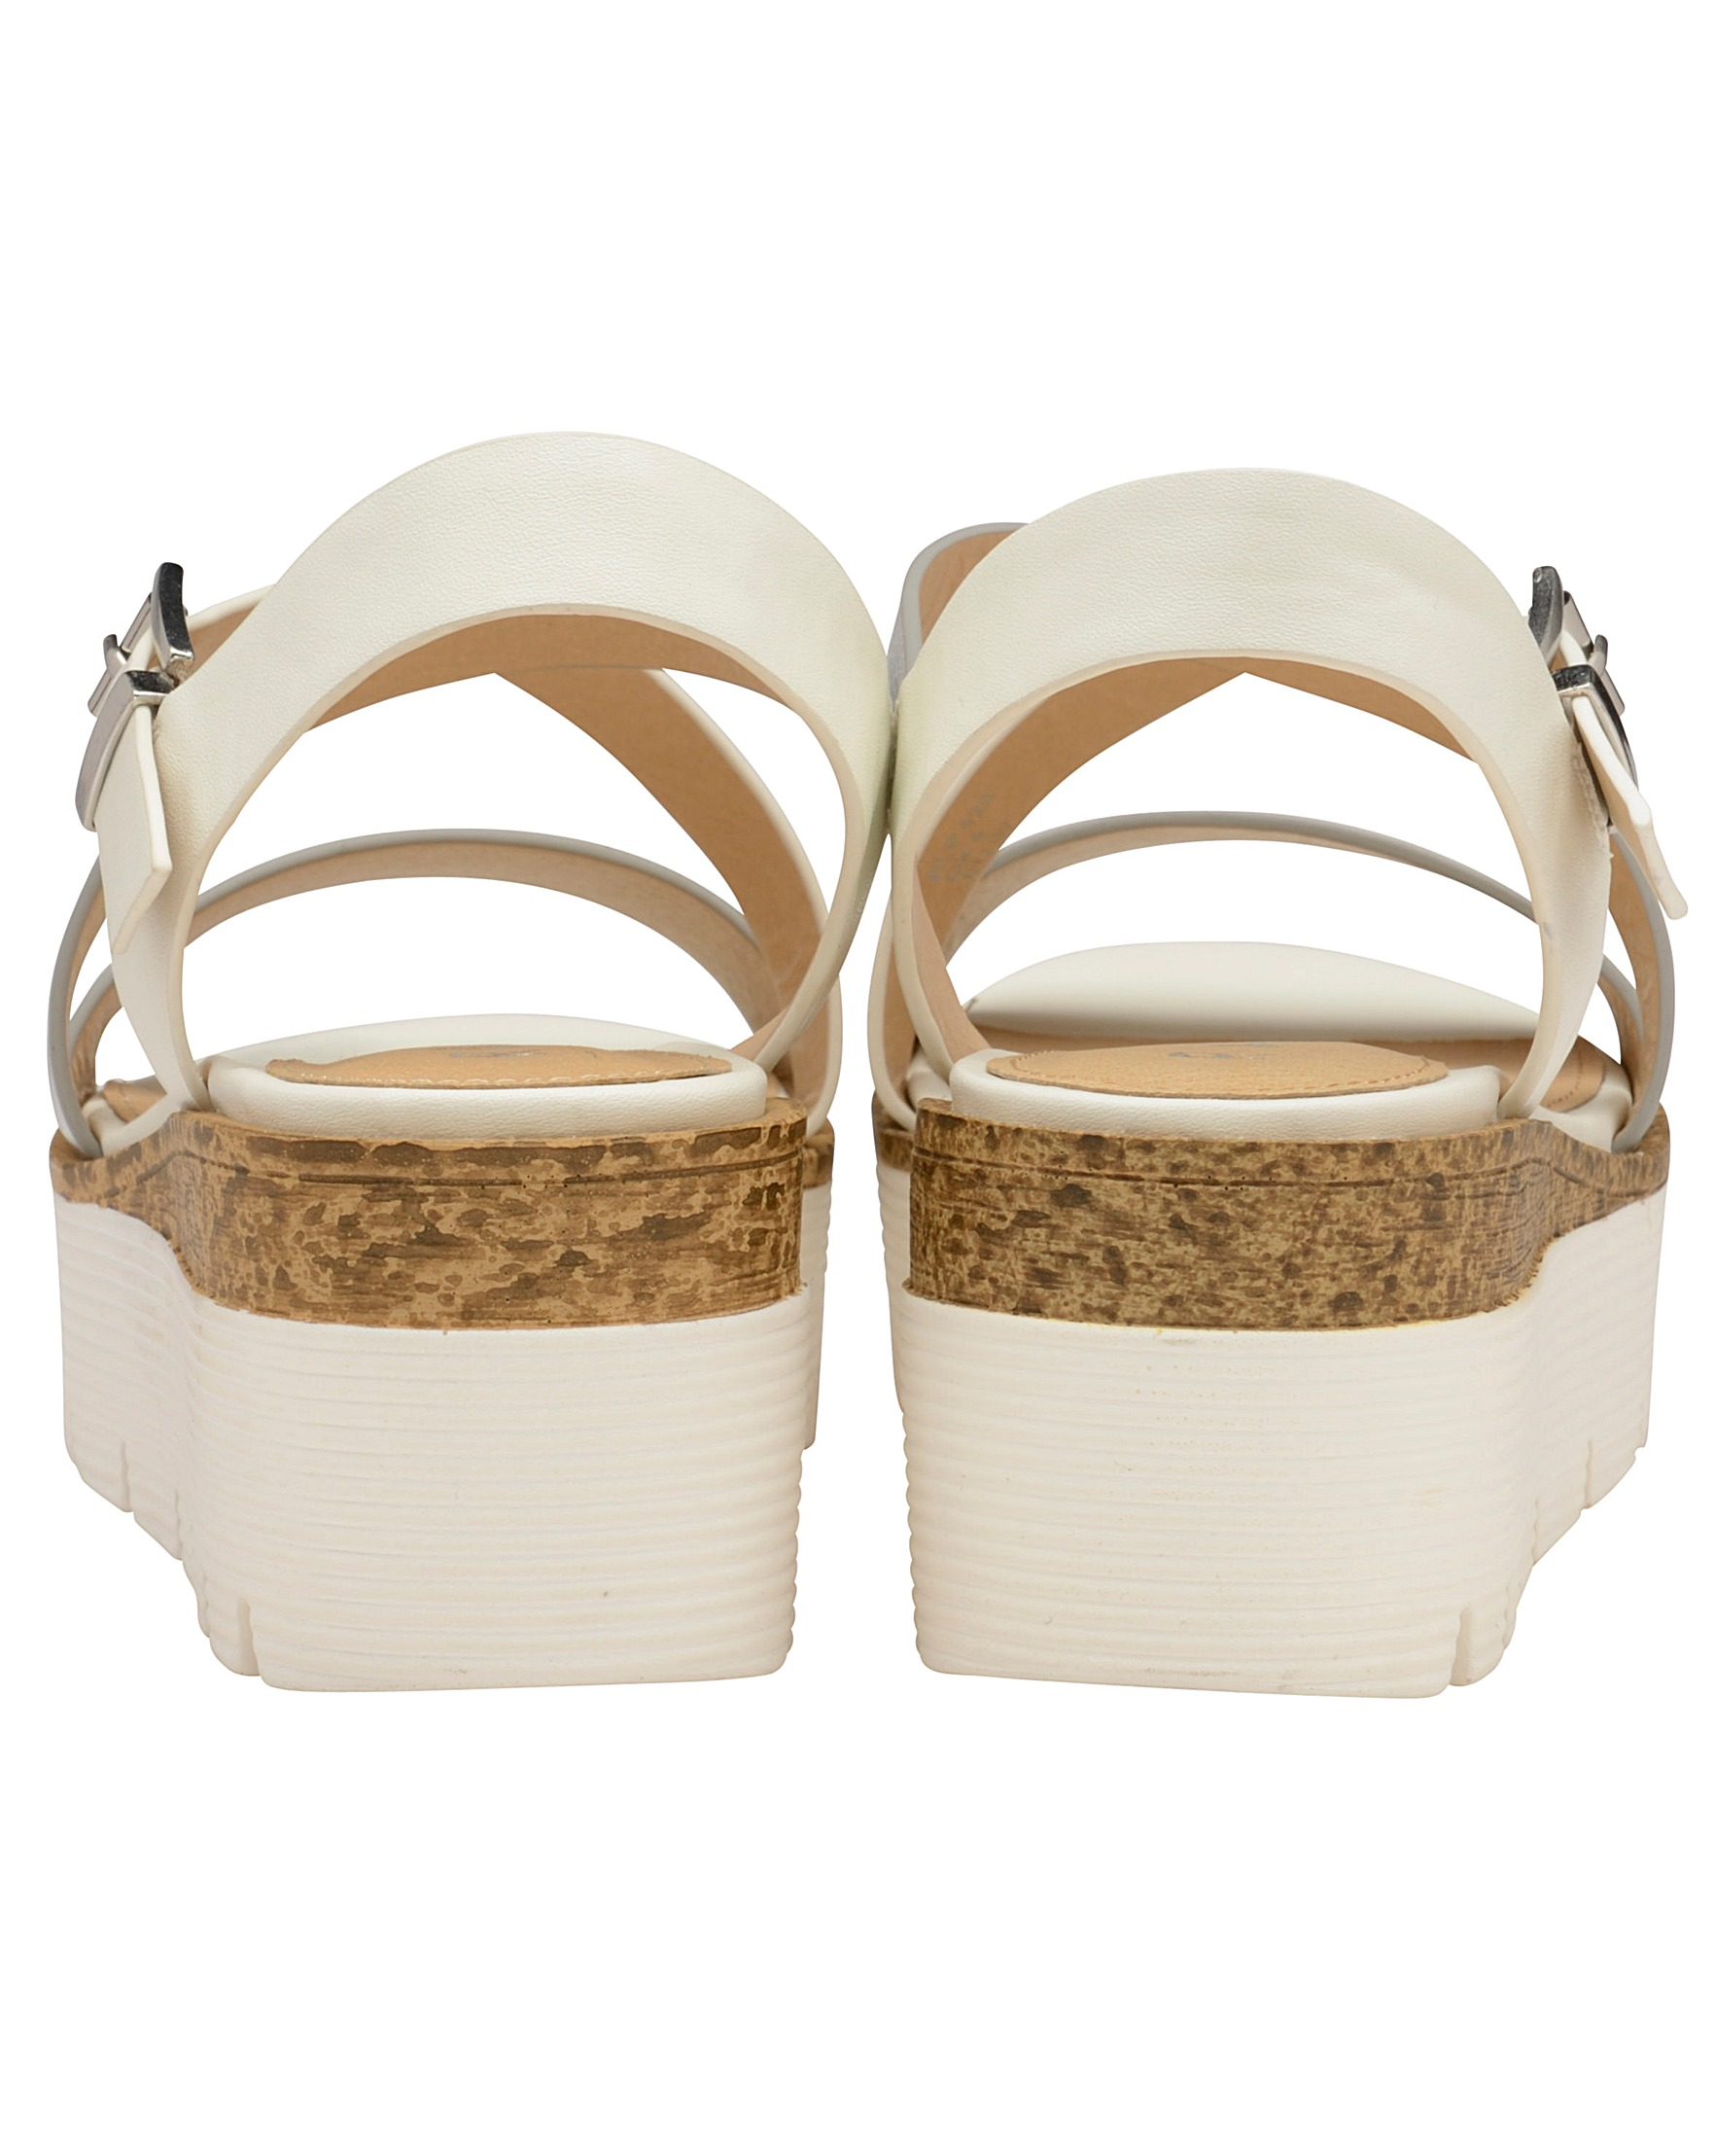 41fe1990ce3f Ravel Layton Flatform Wedge Sandals